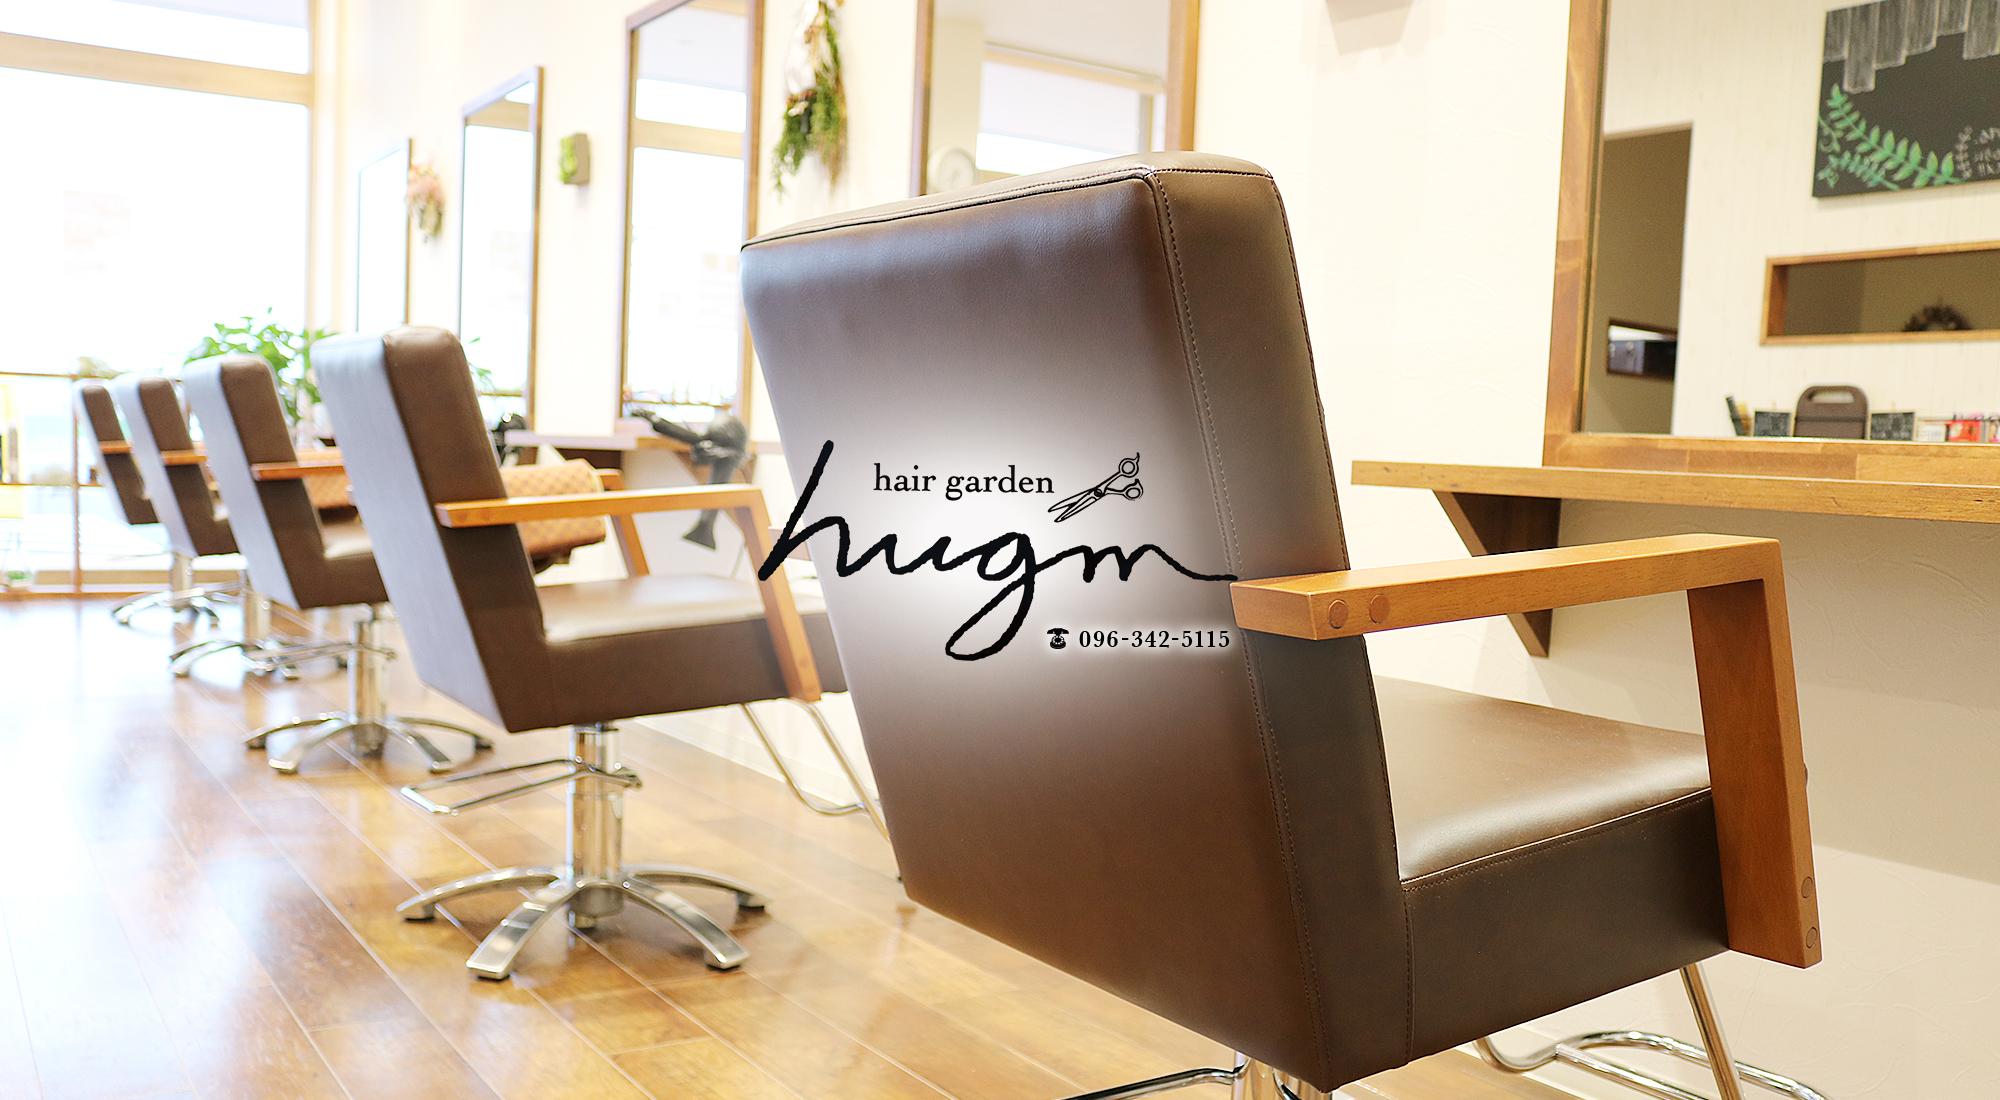 hair garden hugm